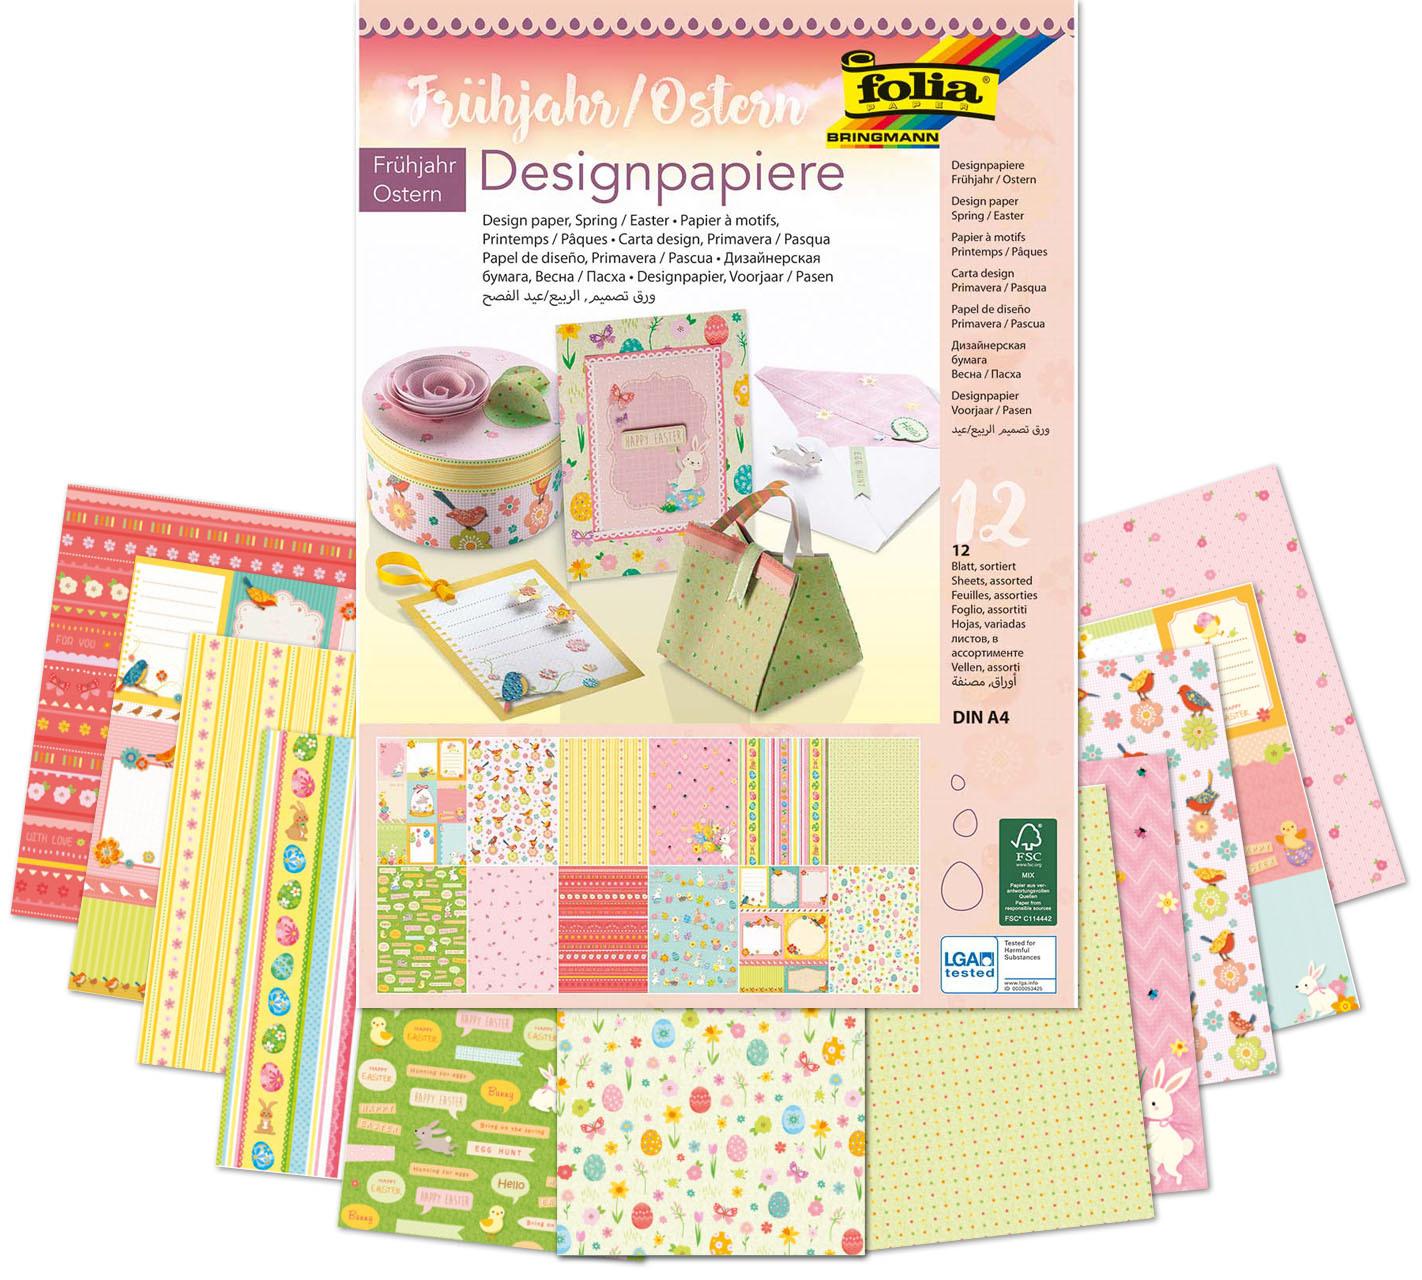 Design-Tonpapier A4, 12 Blatt - Frühjahr/ostern in Gemustertes Tonpapier